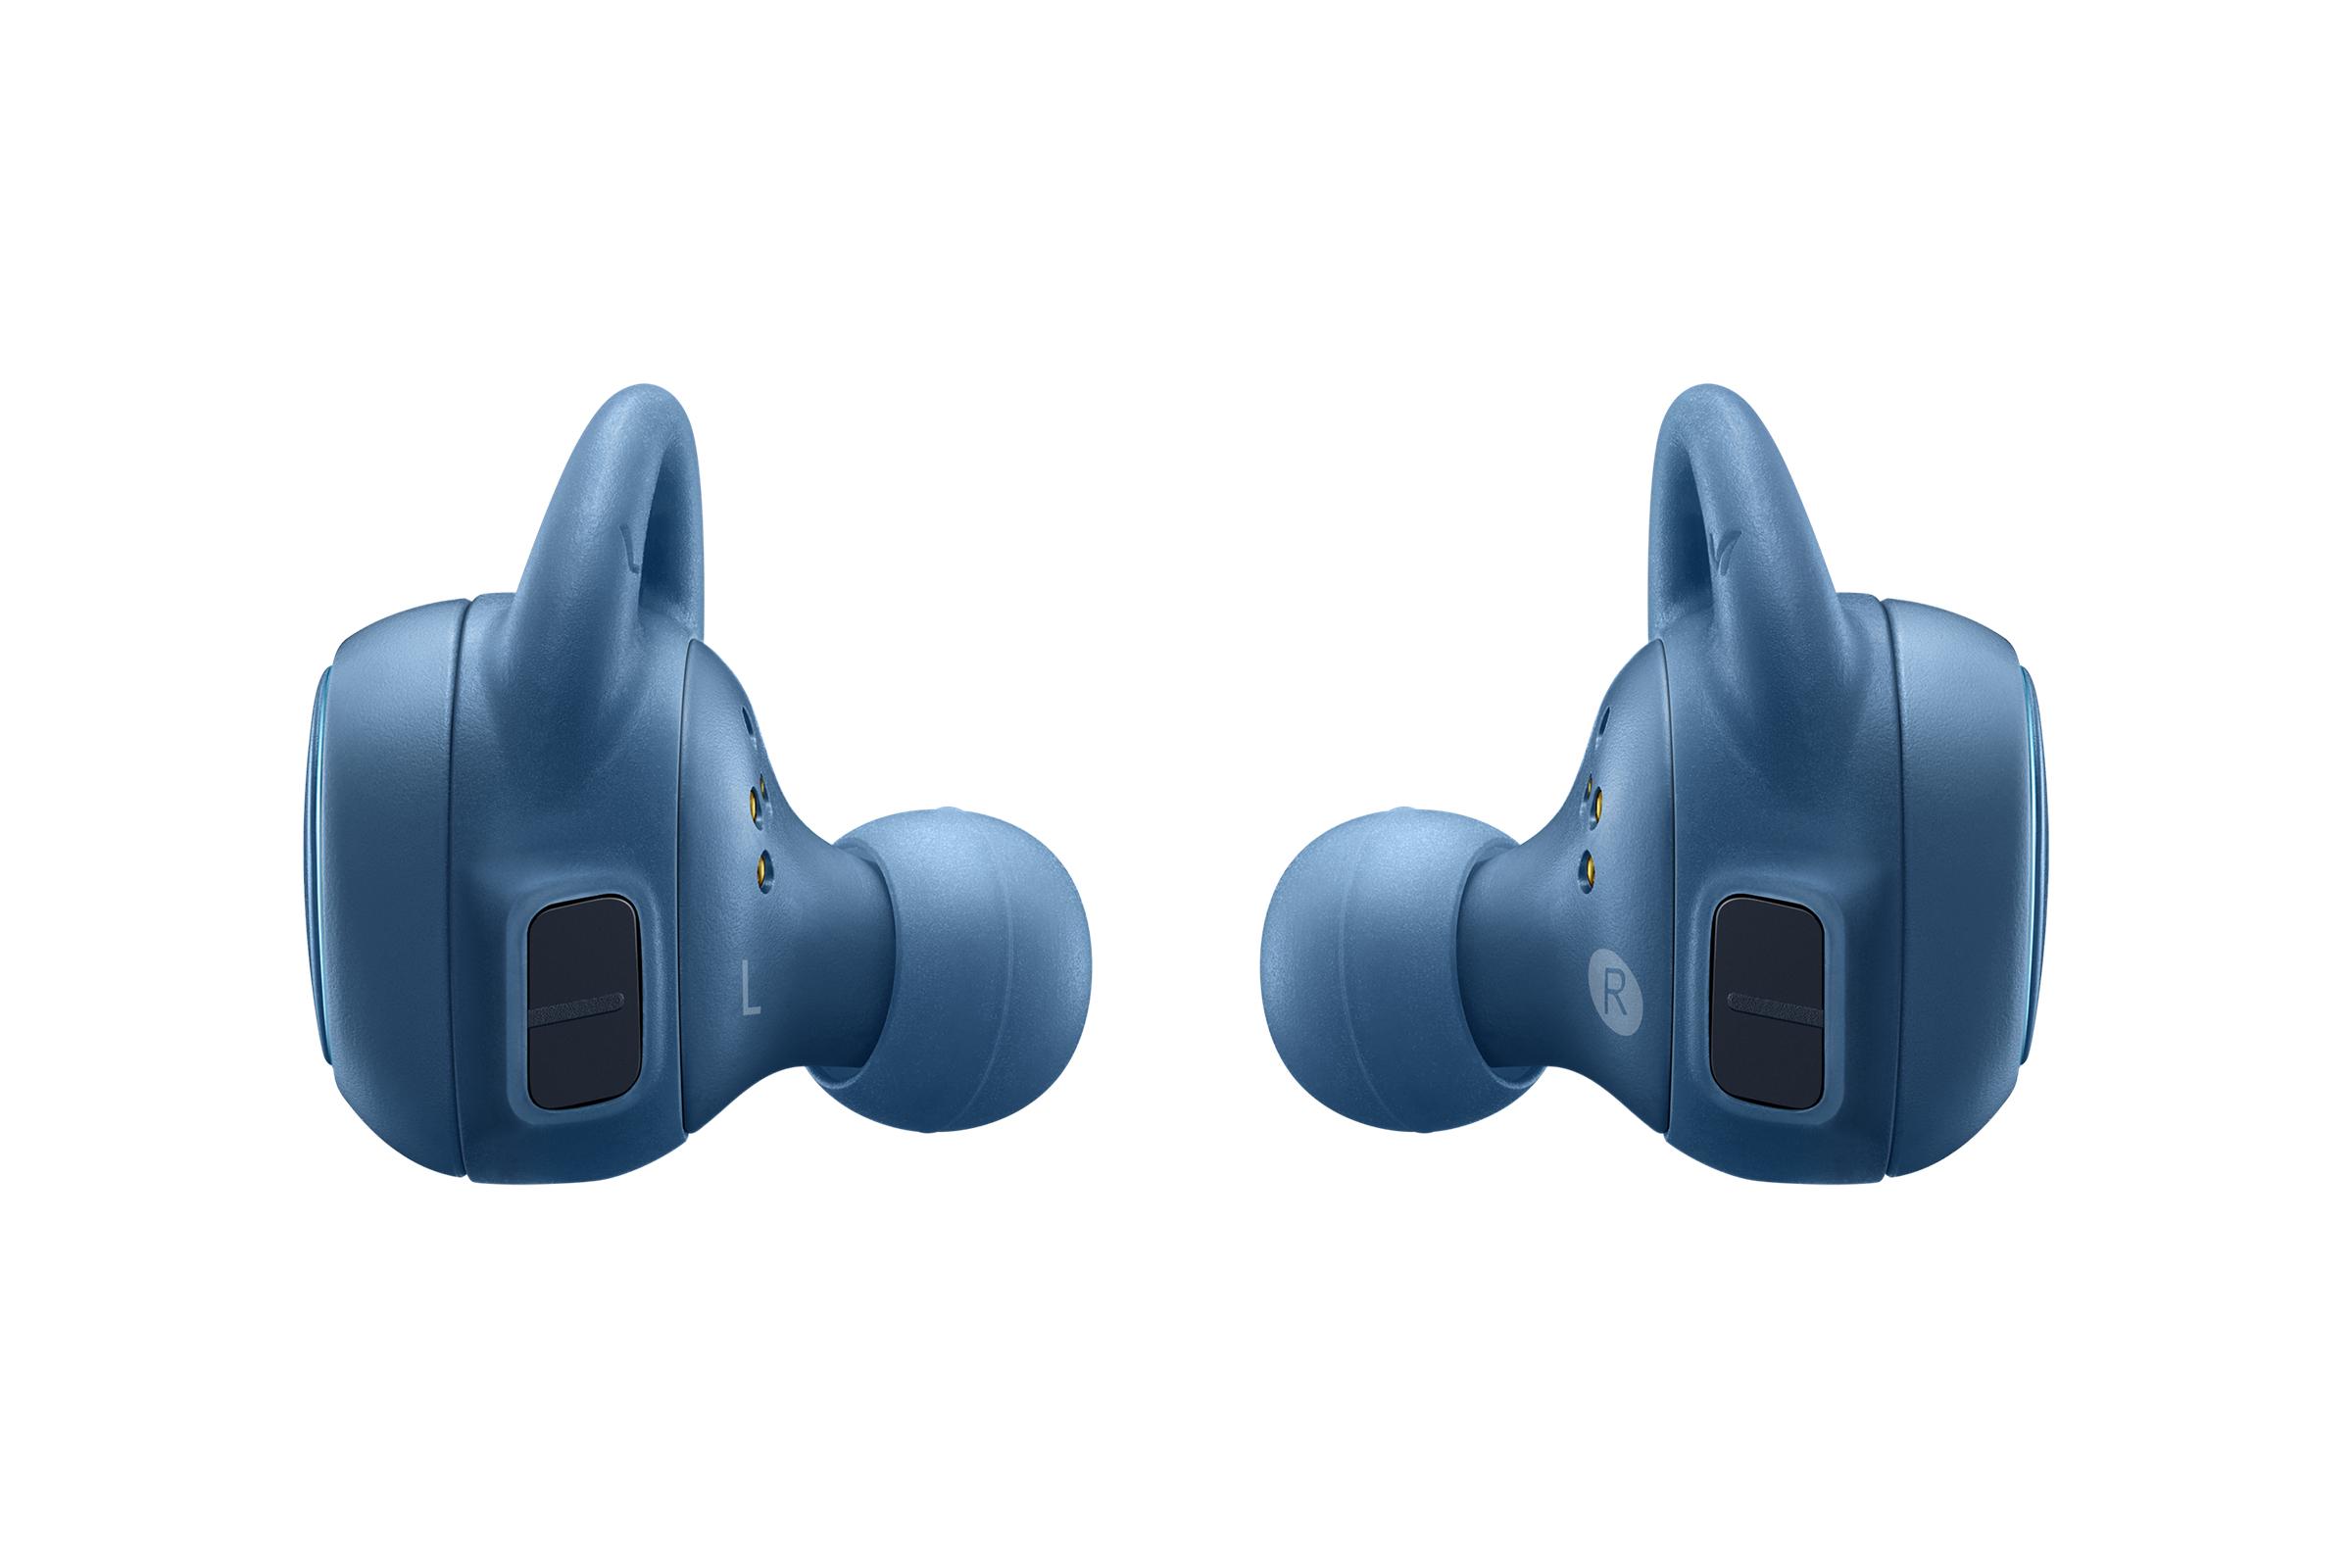 Samsung Gear Iconx Activity Tracking Wireless Earphones